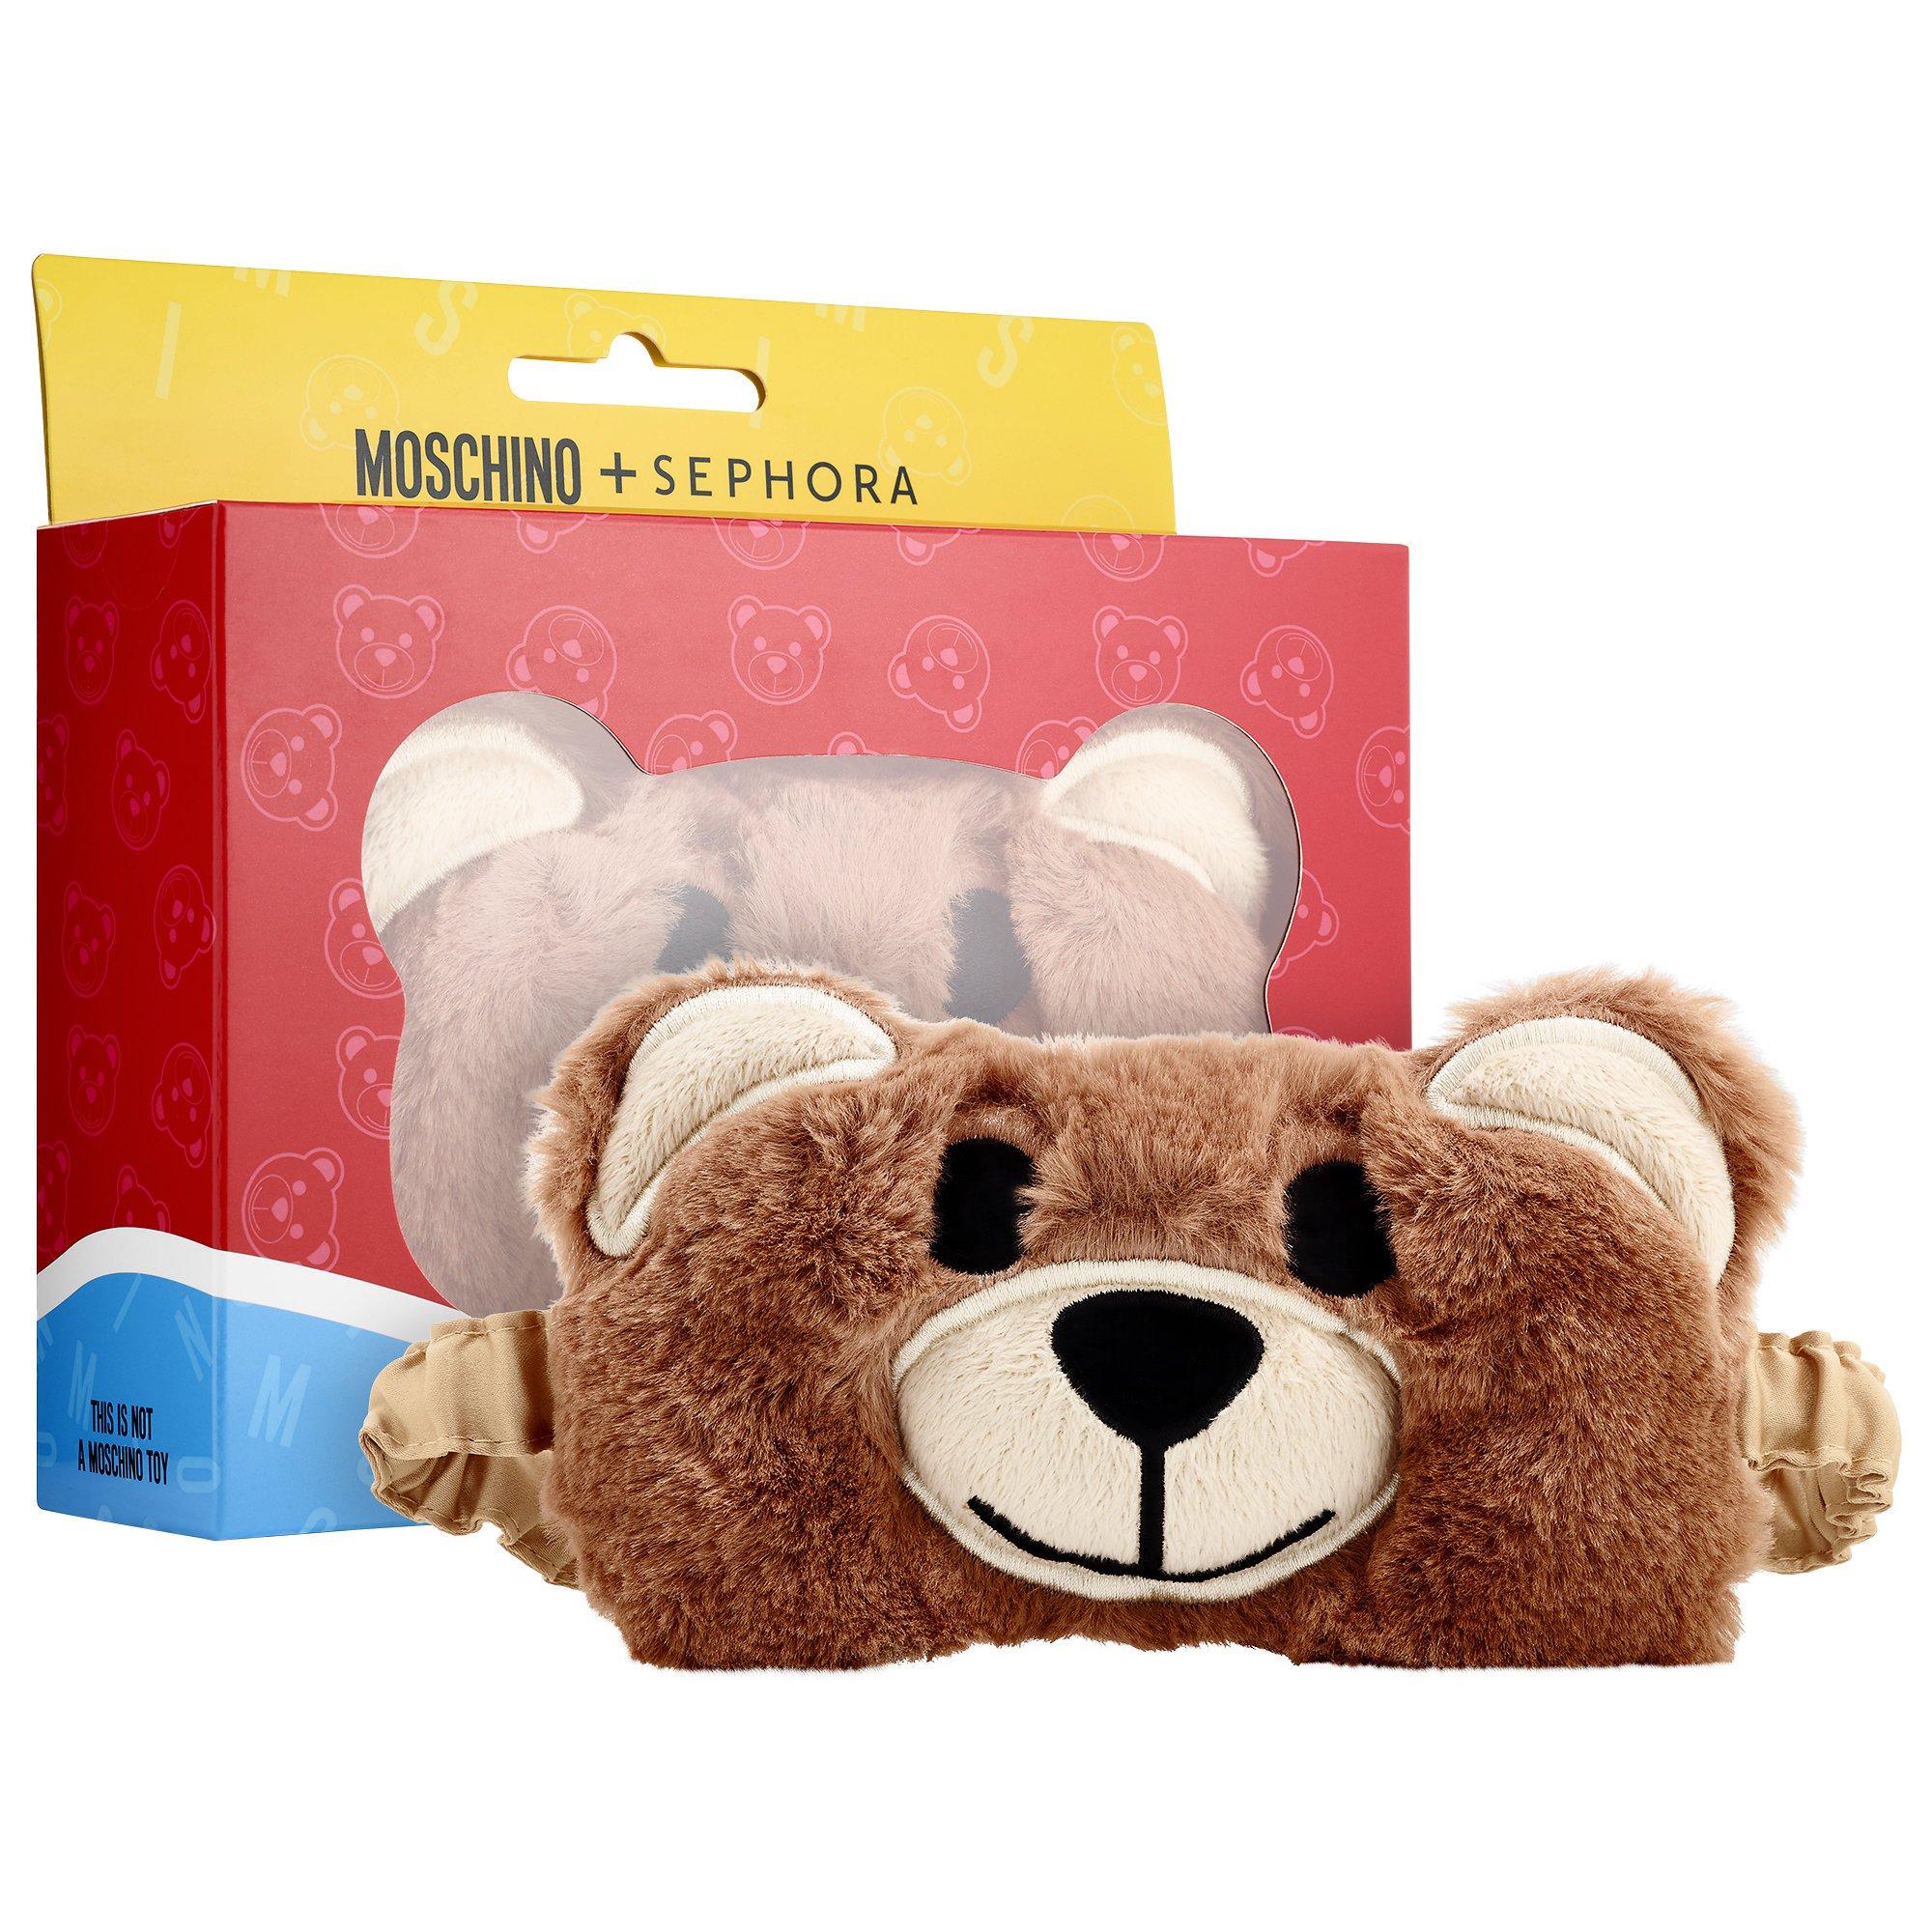 MOSCHINO + SEPHORA Moschino Bear Eye Mask